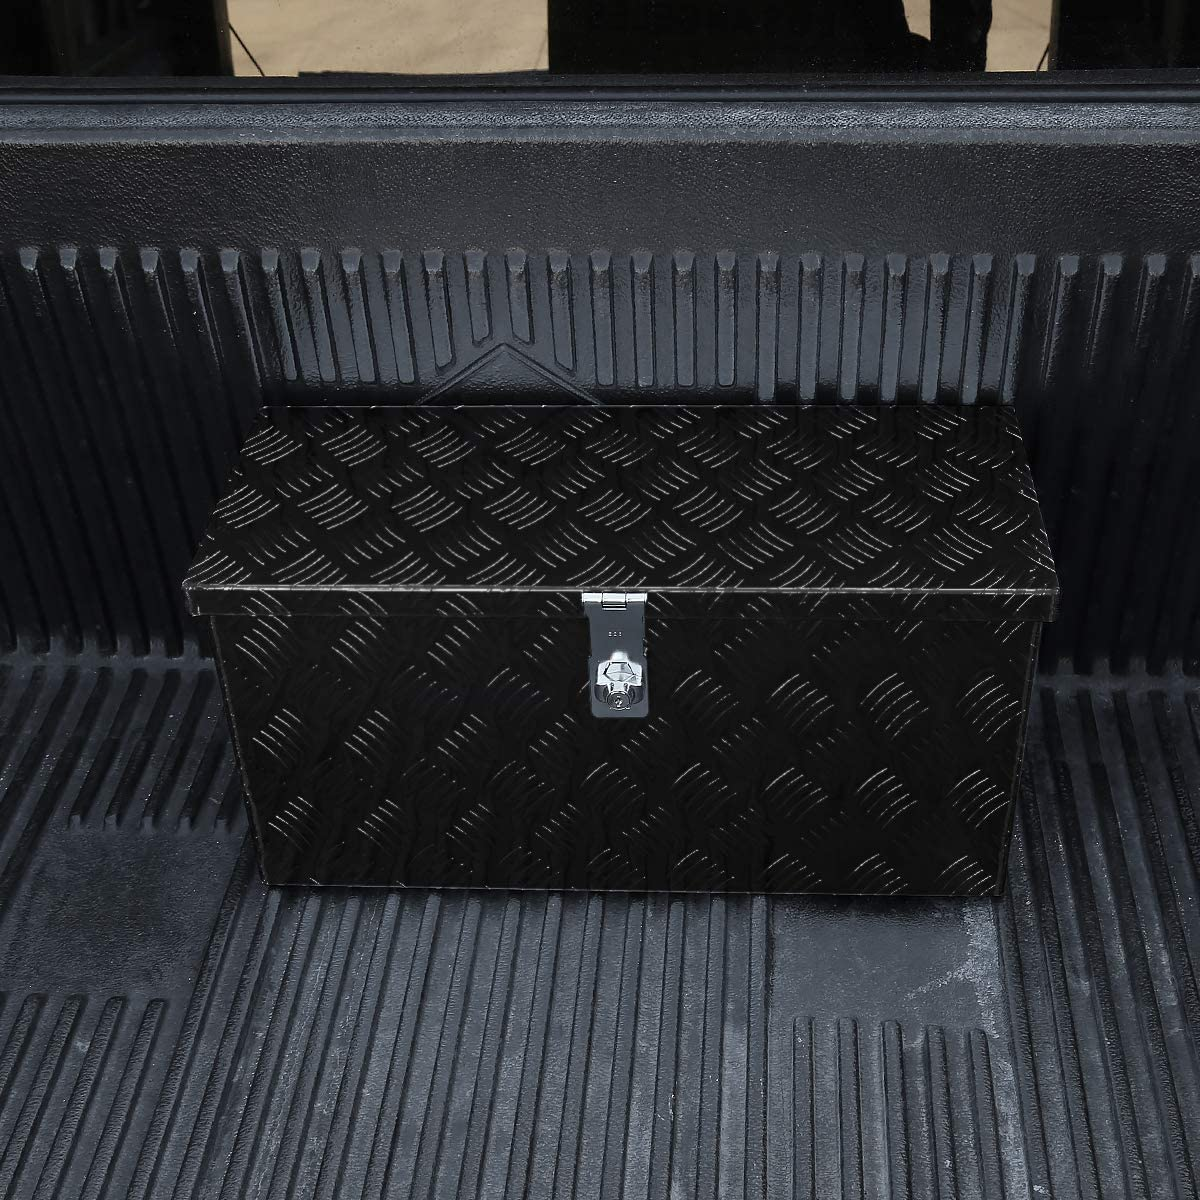 Carpartsinnovate 24x10 Truck Black Pickup Aluminum Tool Box Trailer Storage w//Handles /& Lock